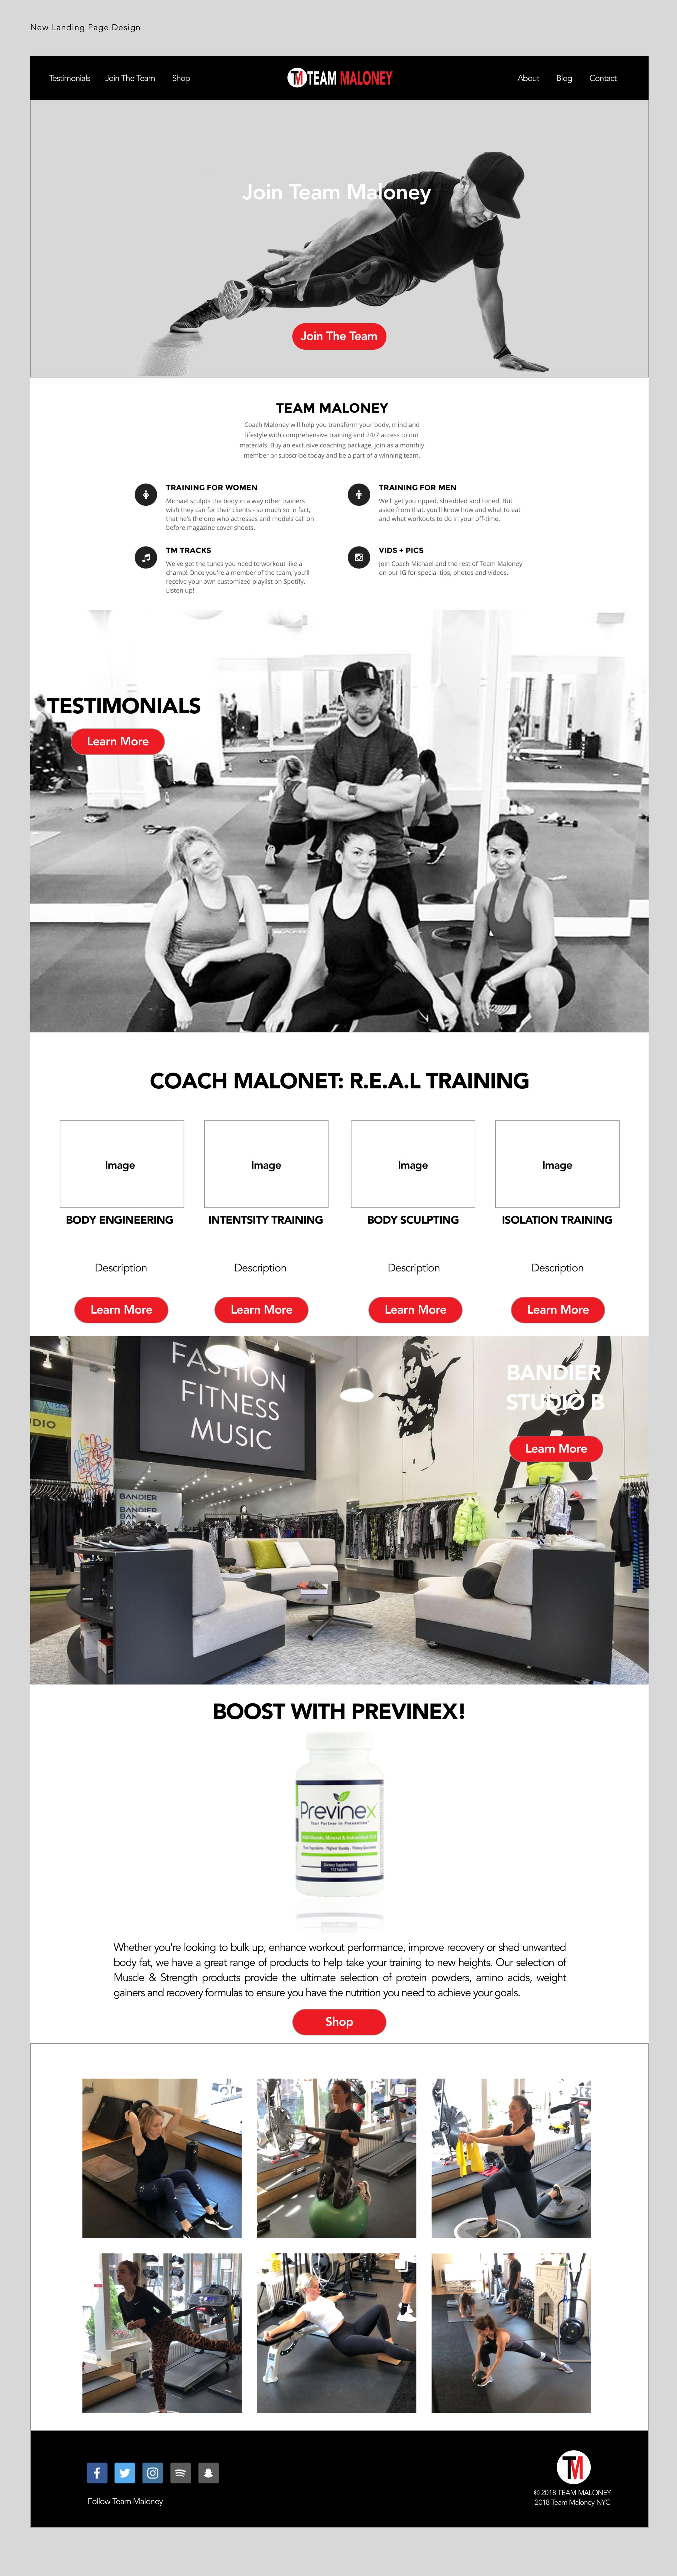 Teammaloney_Website.png